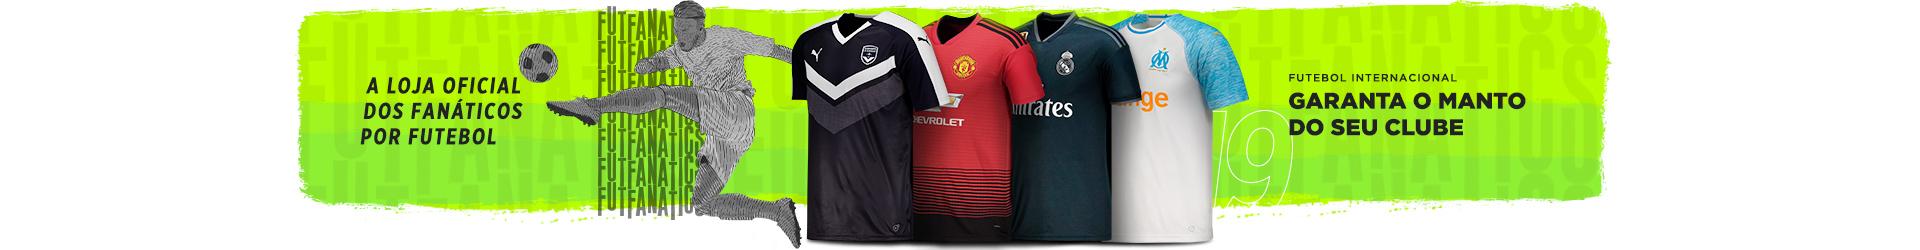 Camisas de Futebol do Bayern de Munique - FutFanatics 85425ea6ecdc1